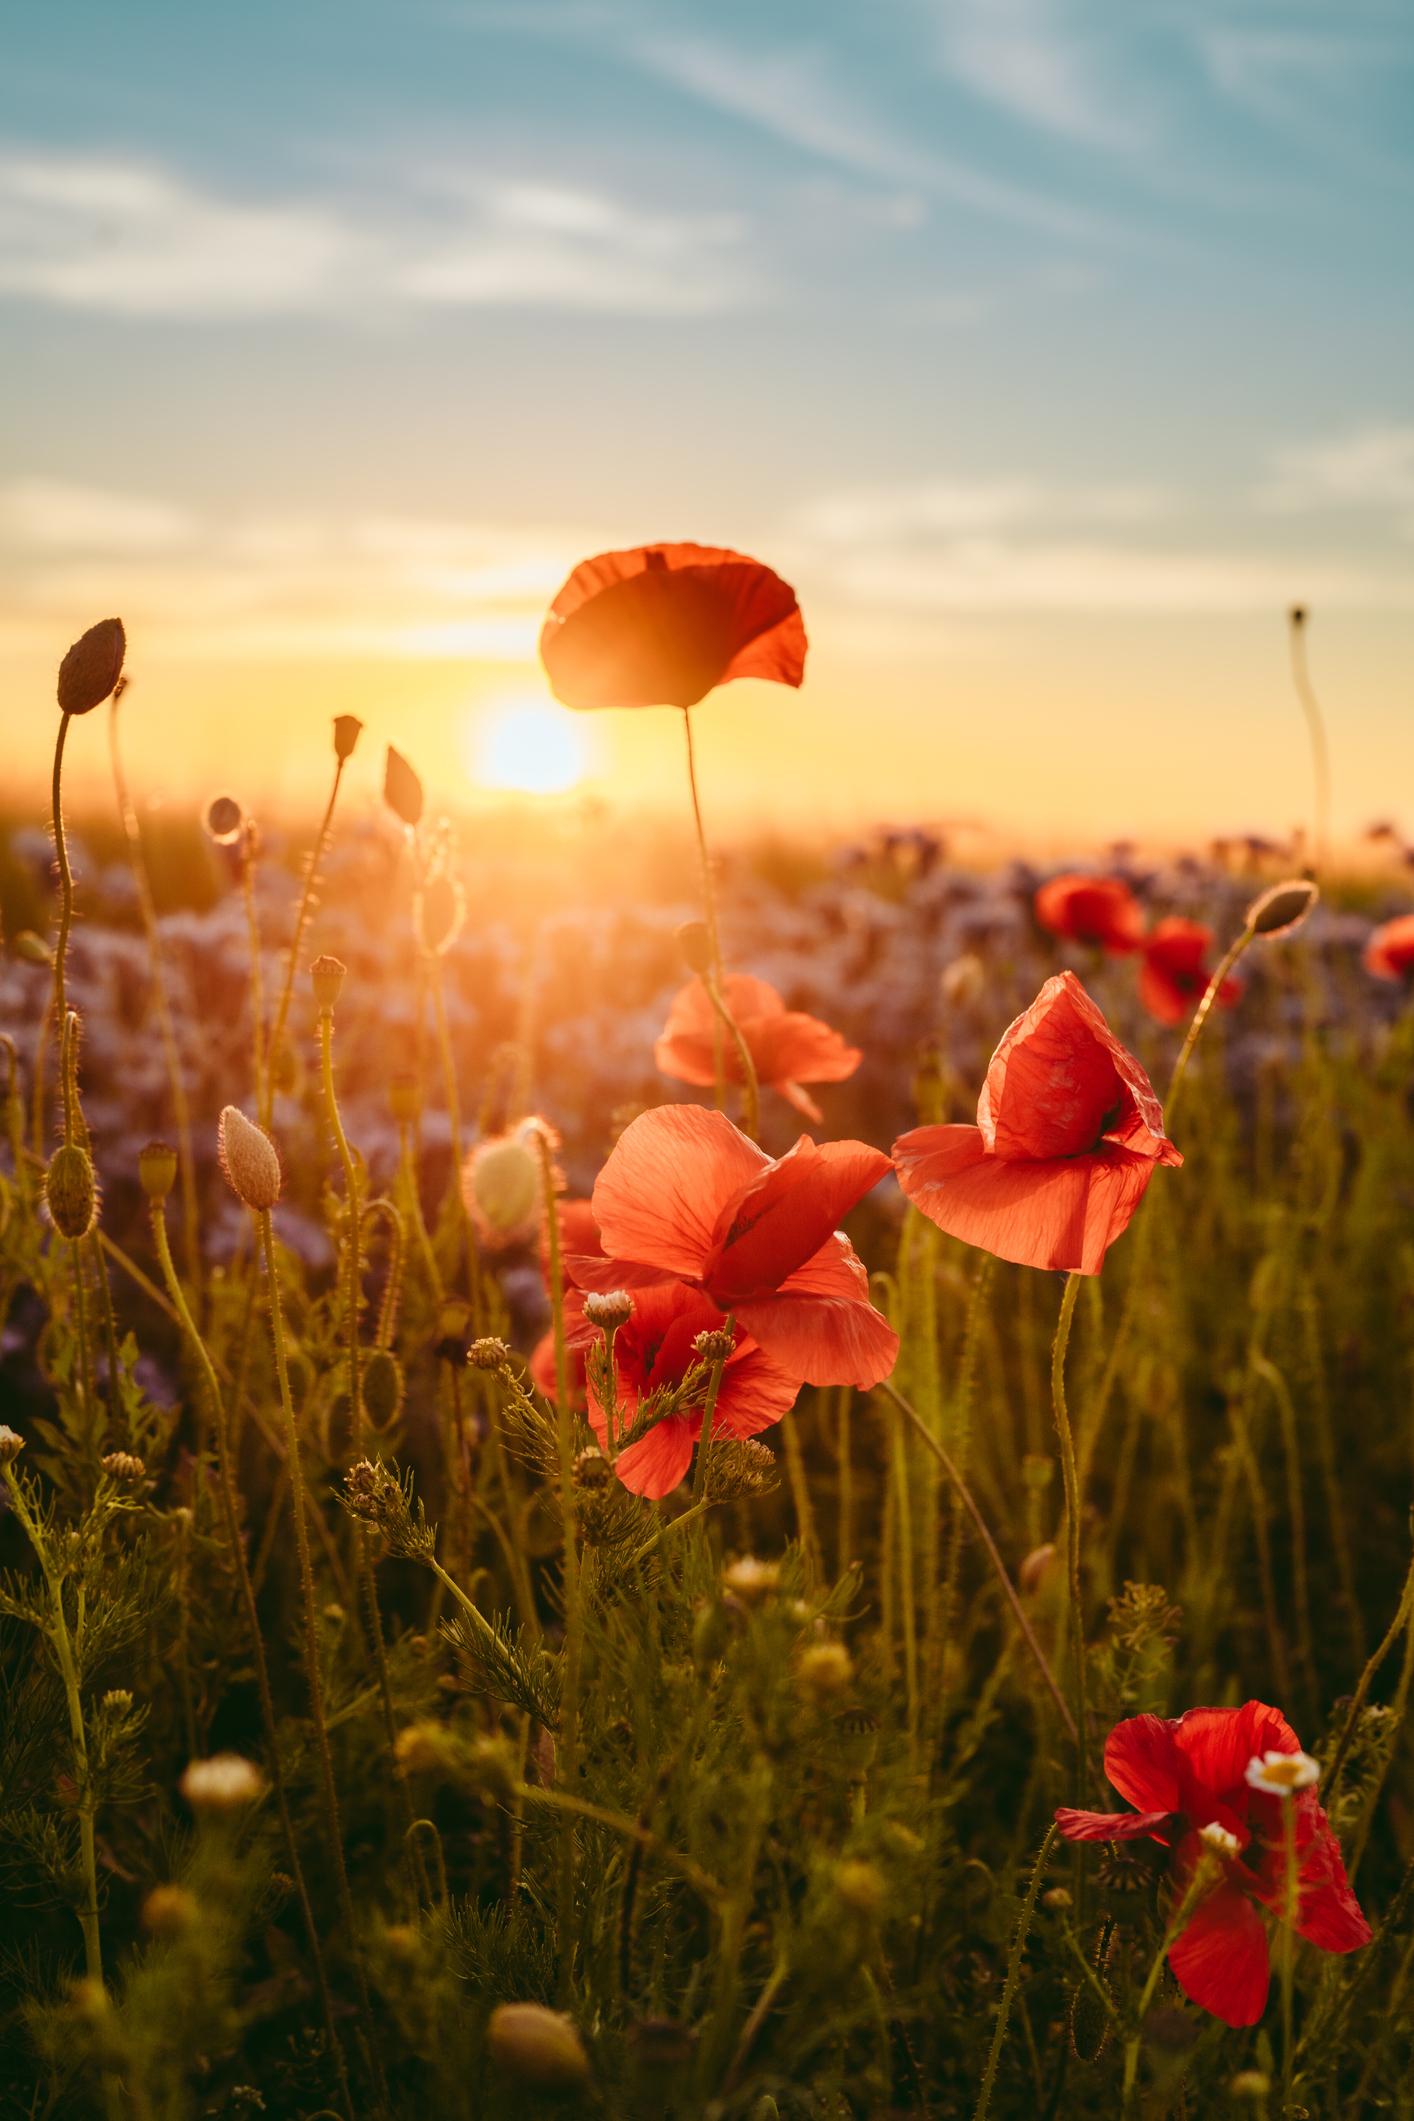 Poppy and agriculture fields in sunset in beautiful österlen flowers in bloom. Photo taken in sunlight in evening in summer.